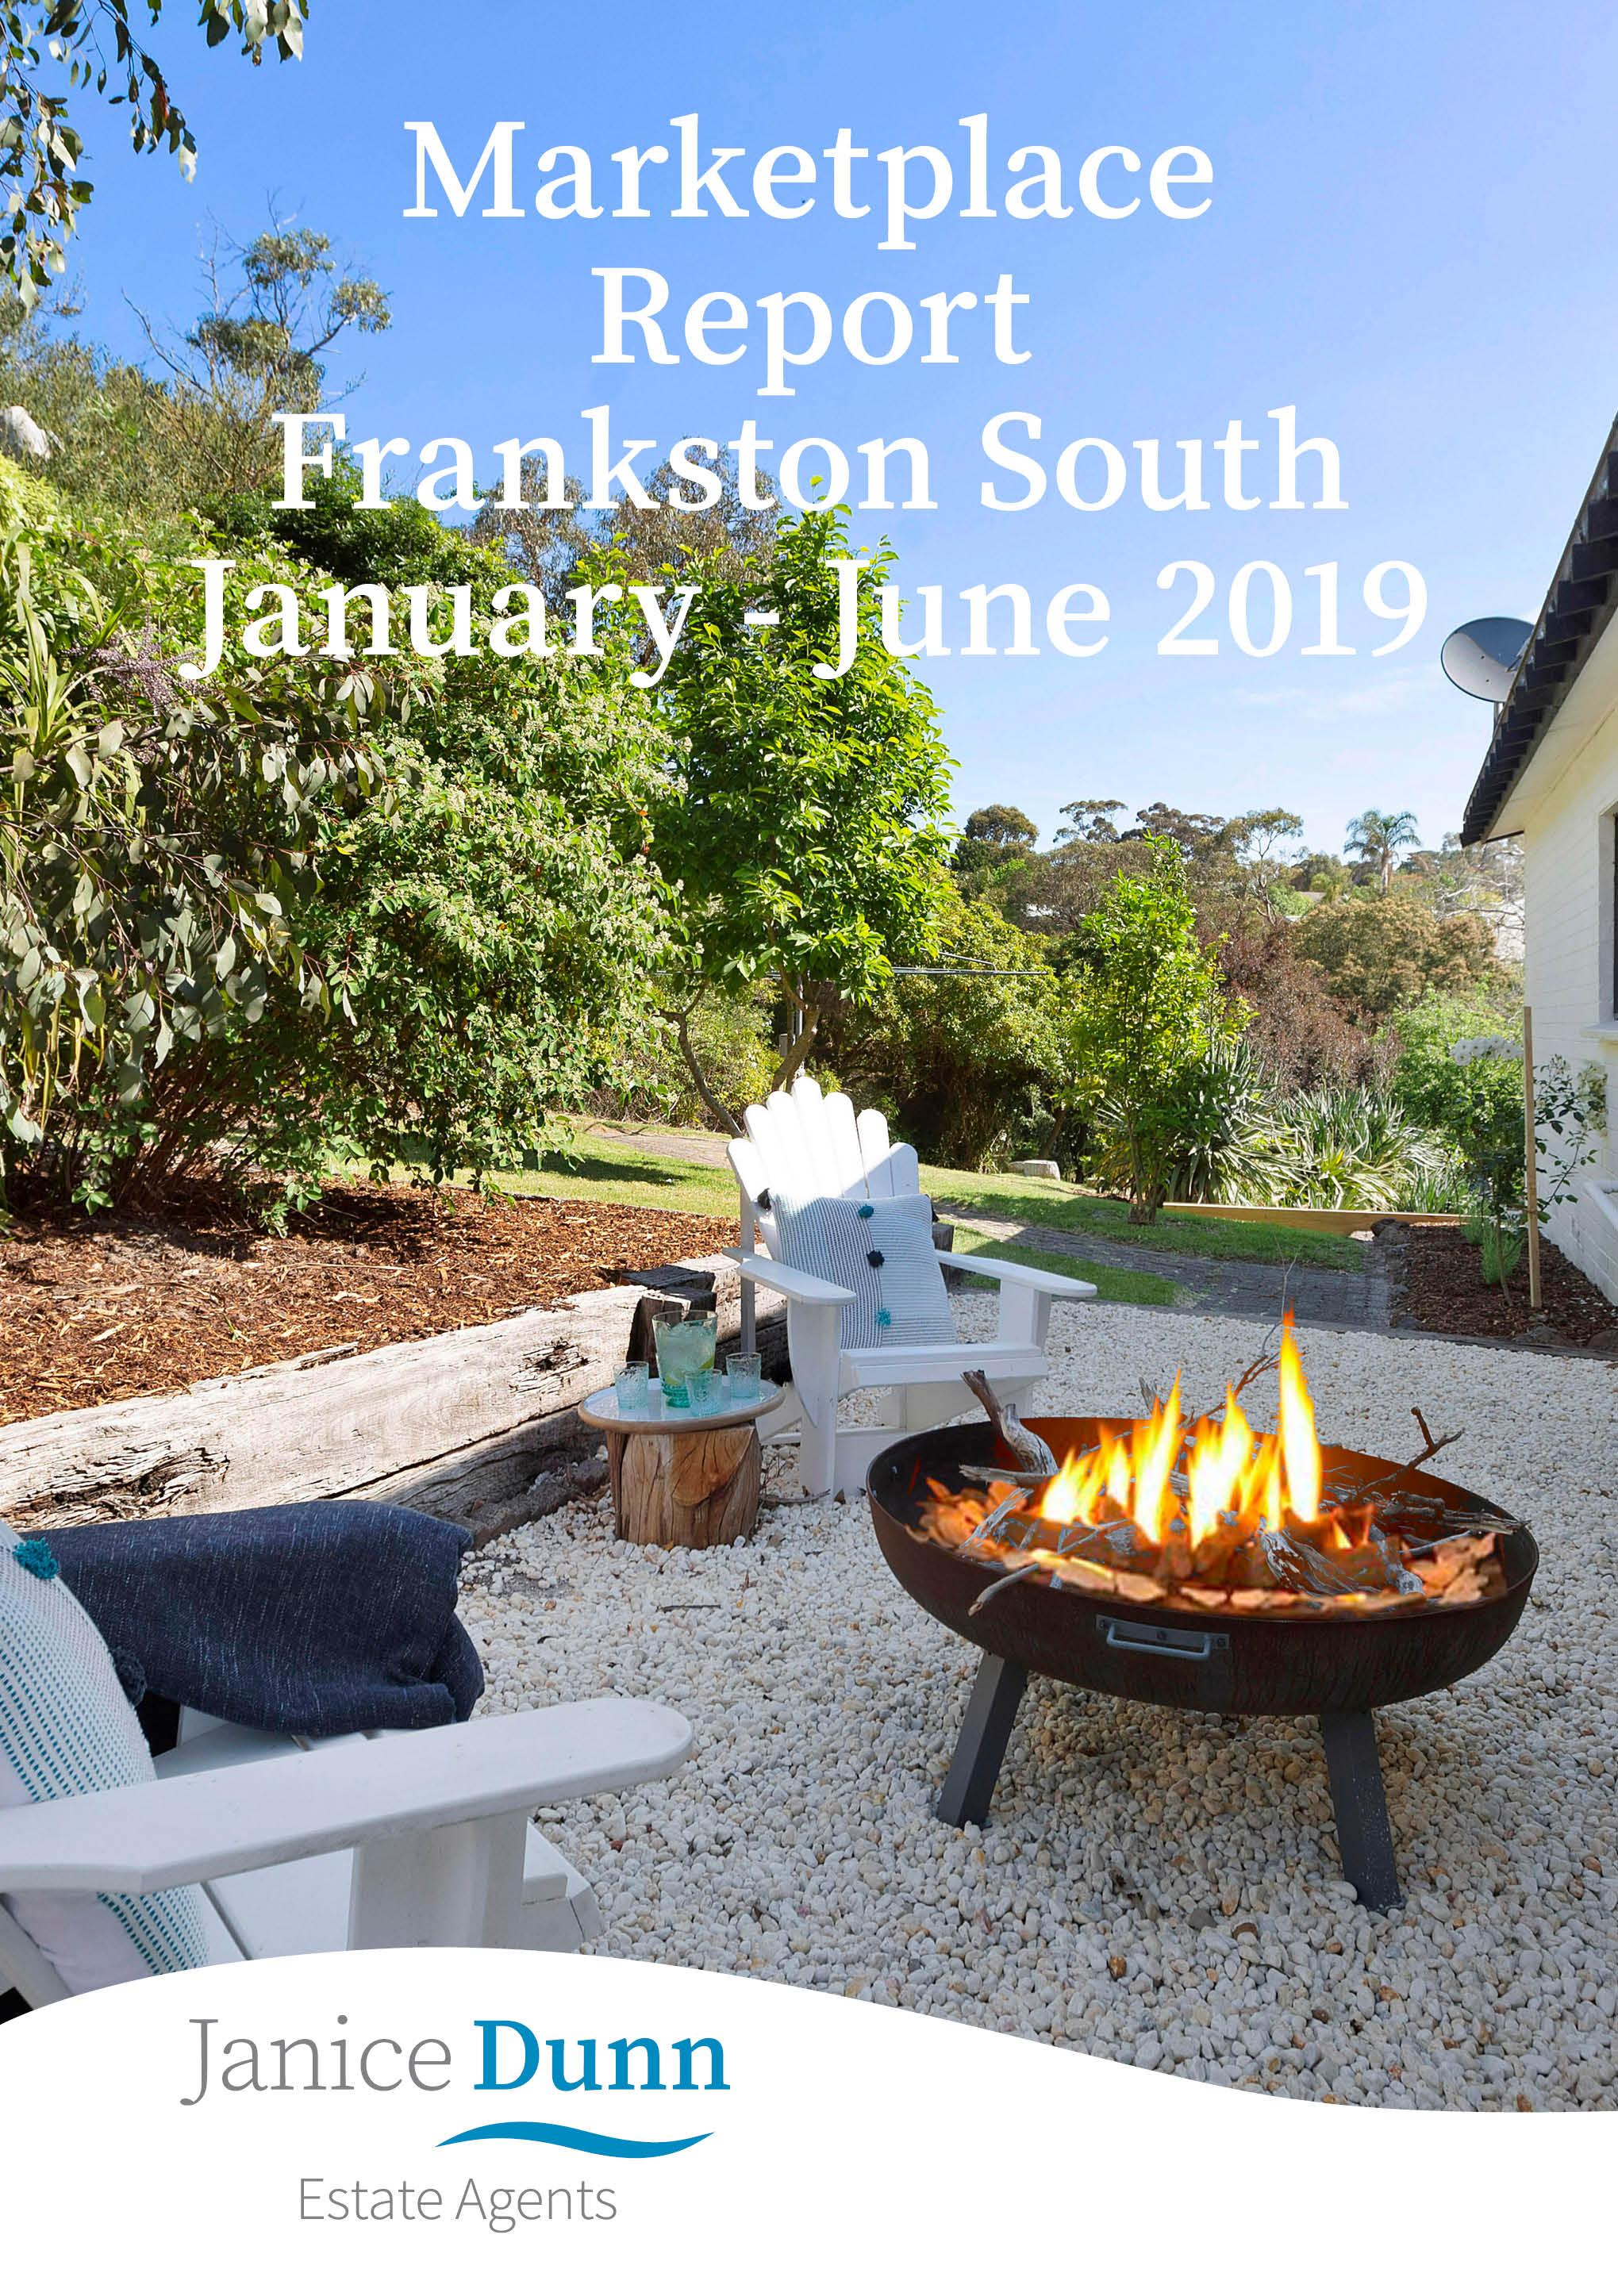 frankston south cover.jpg